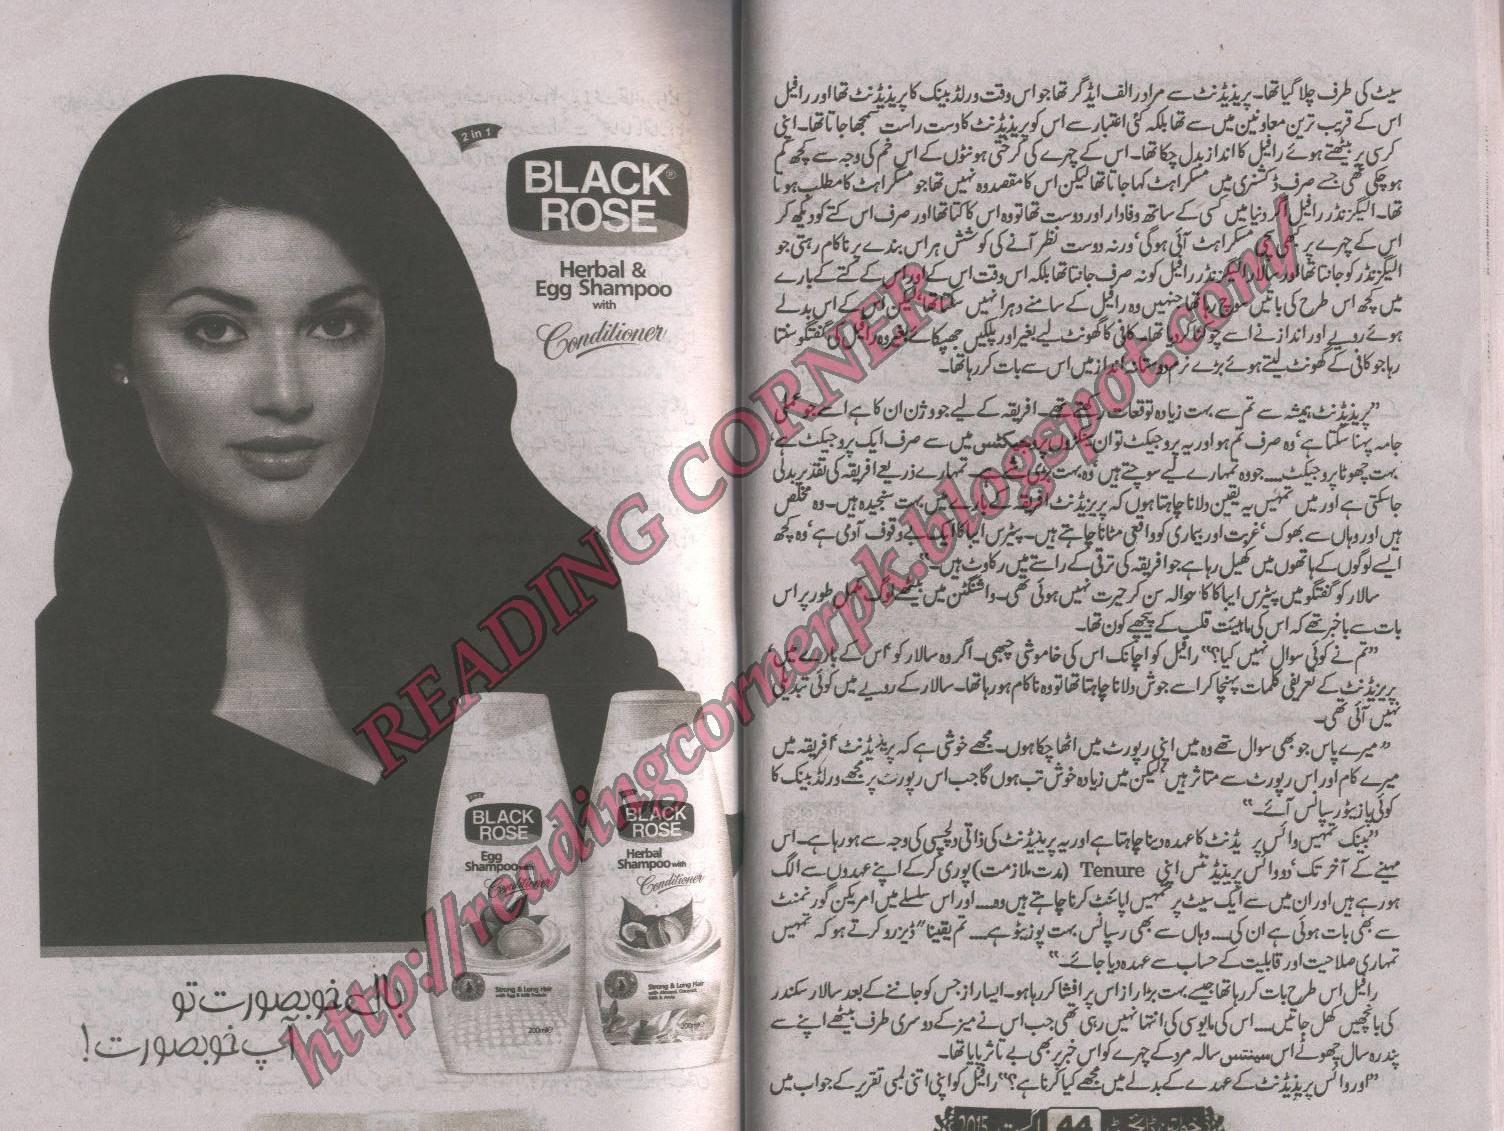 Kitab dost aab e hayat novel by umaira ahmed episode 10